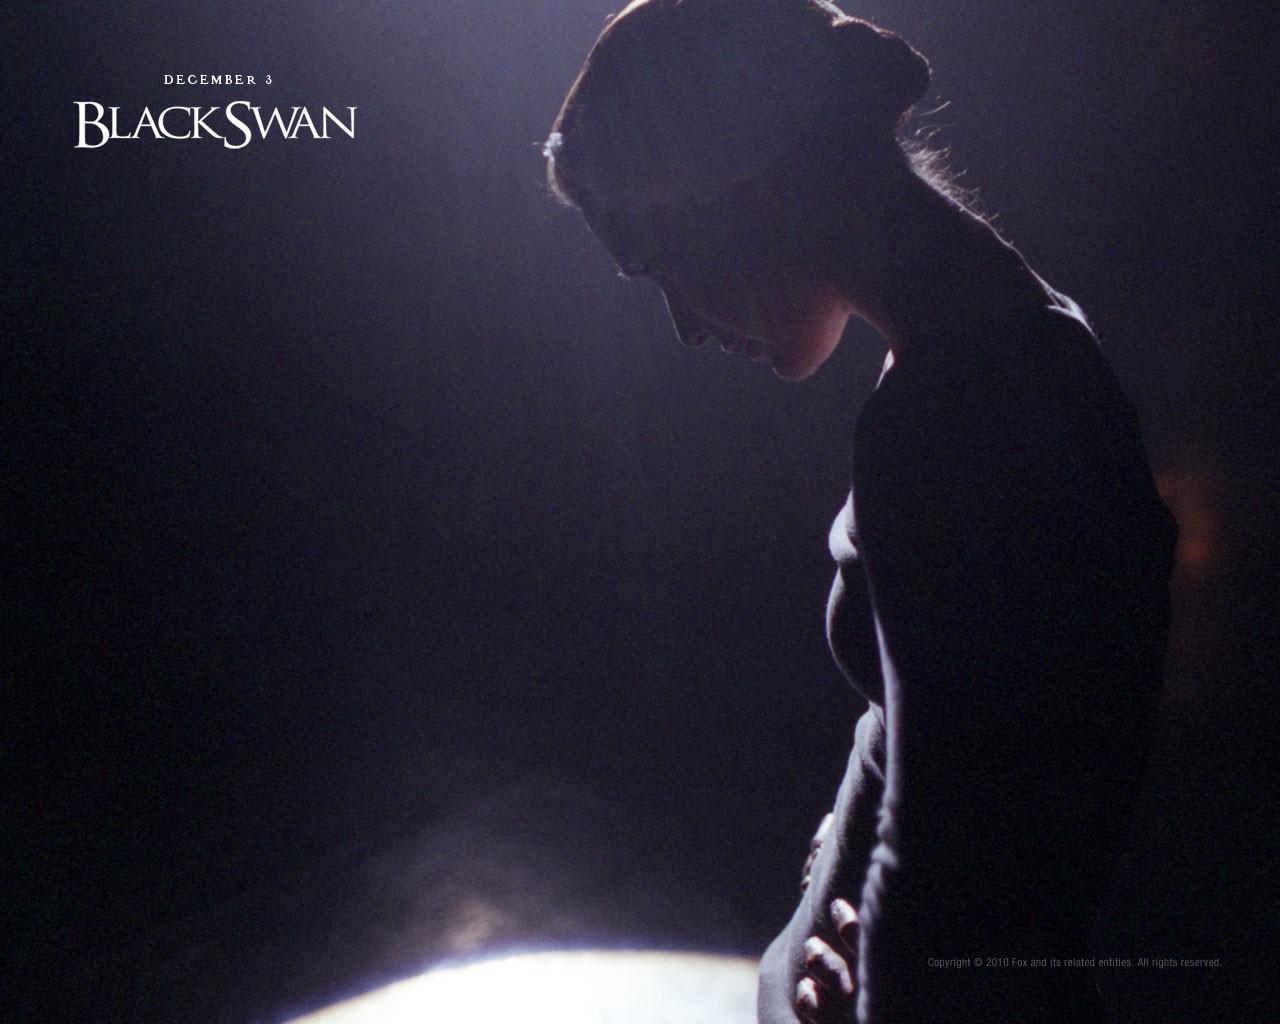 Poster di Natalie Portman per il thriller Black Swan